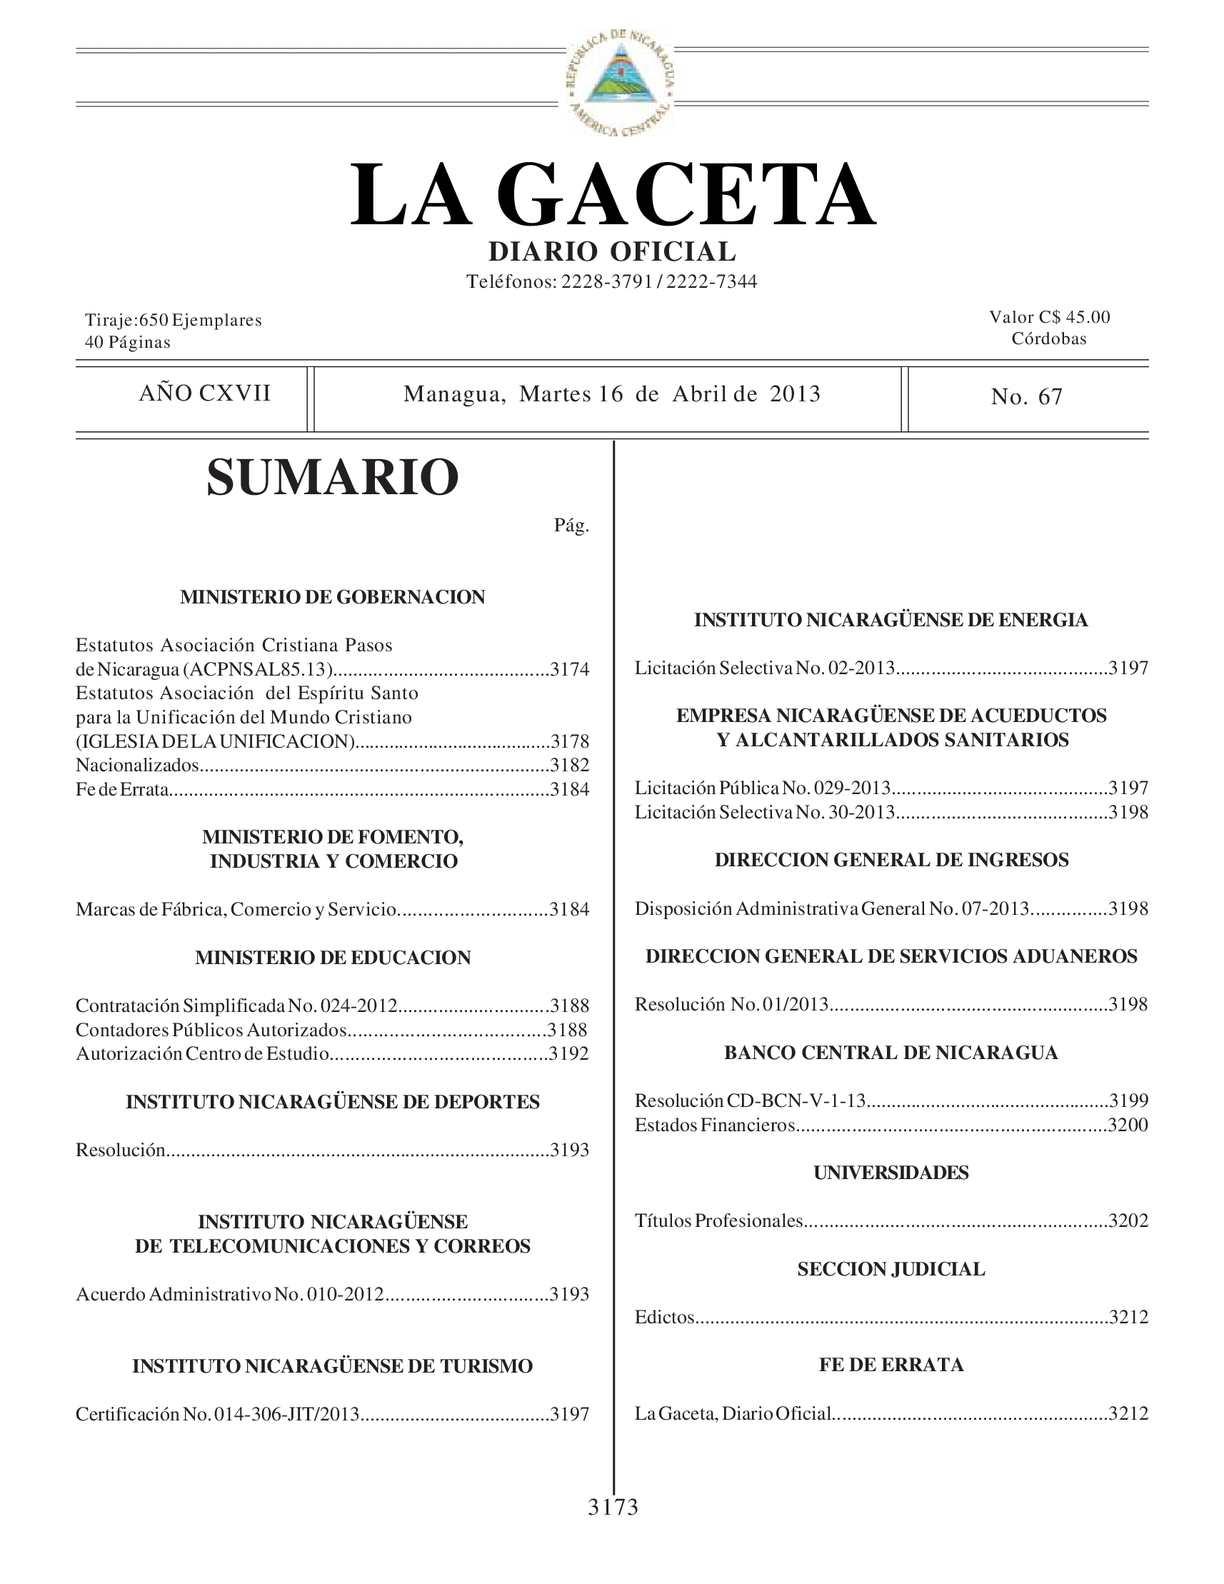 67 Gaceta, Martes 16 De Abril 2013